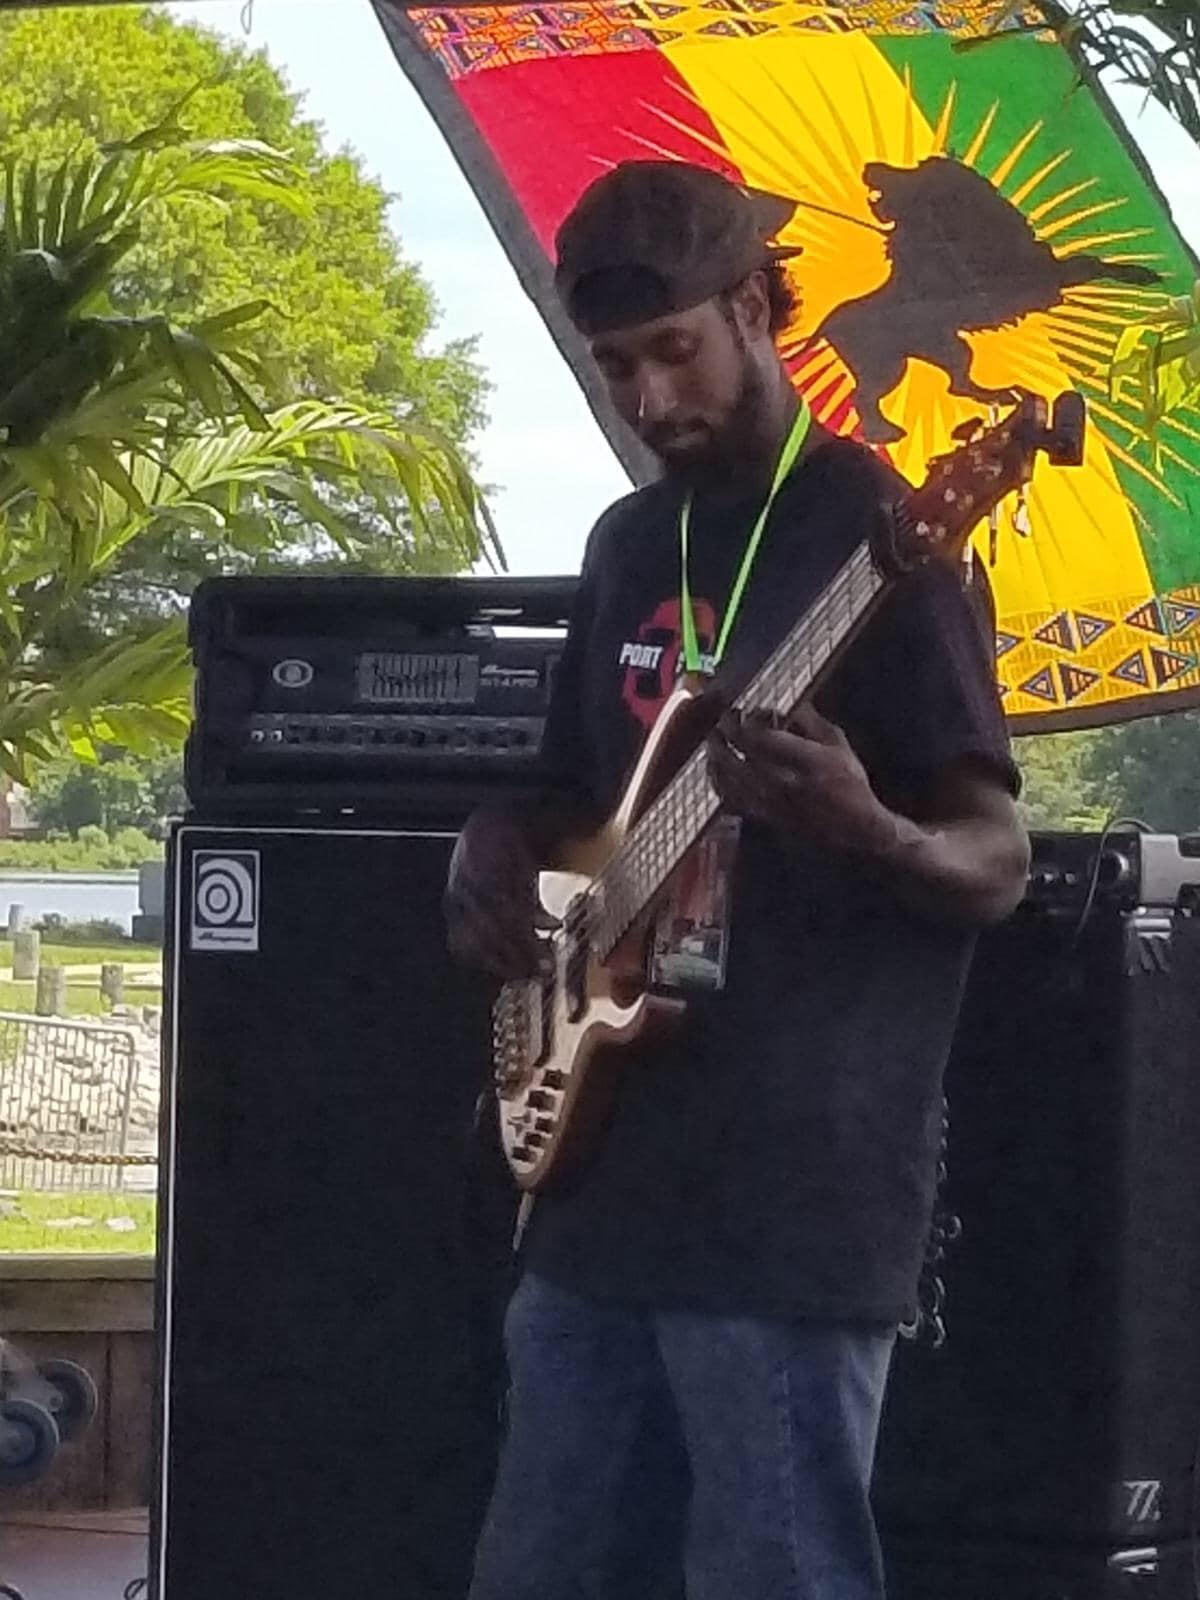 Williamsburg Virginia Live Music Finder Greg Gutty & The Port Of Reign2